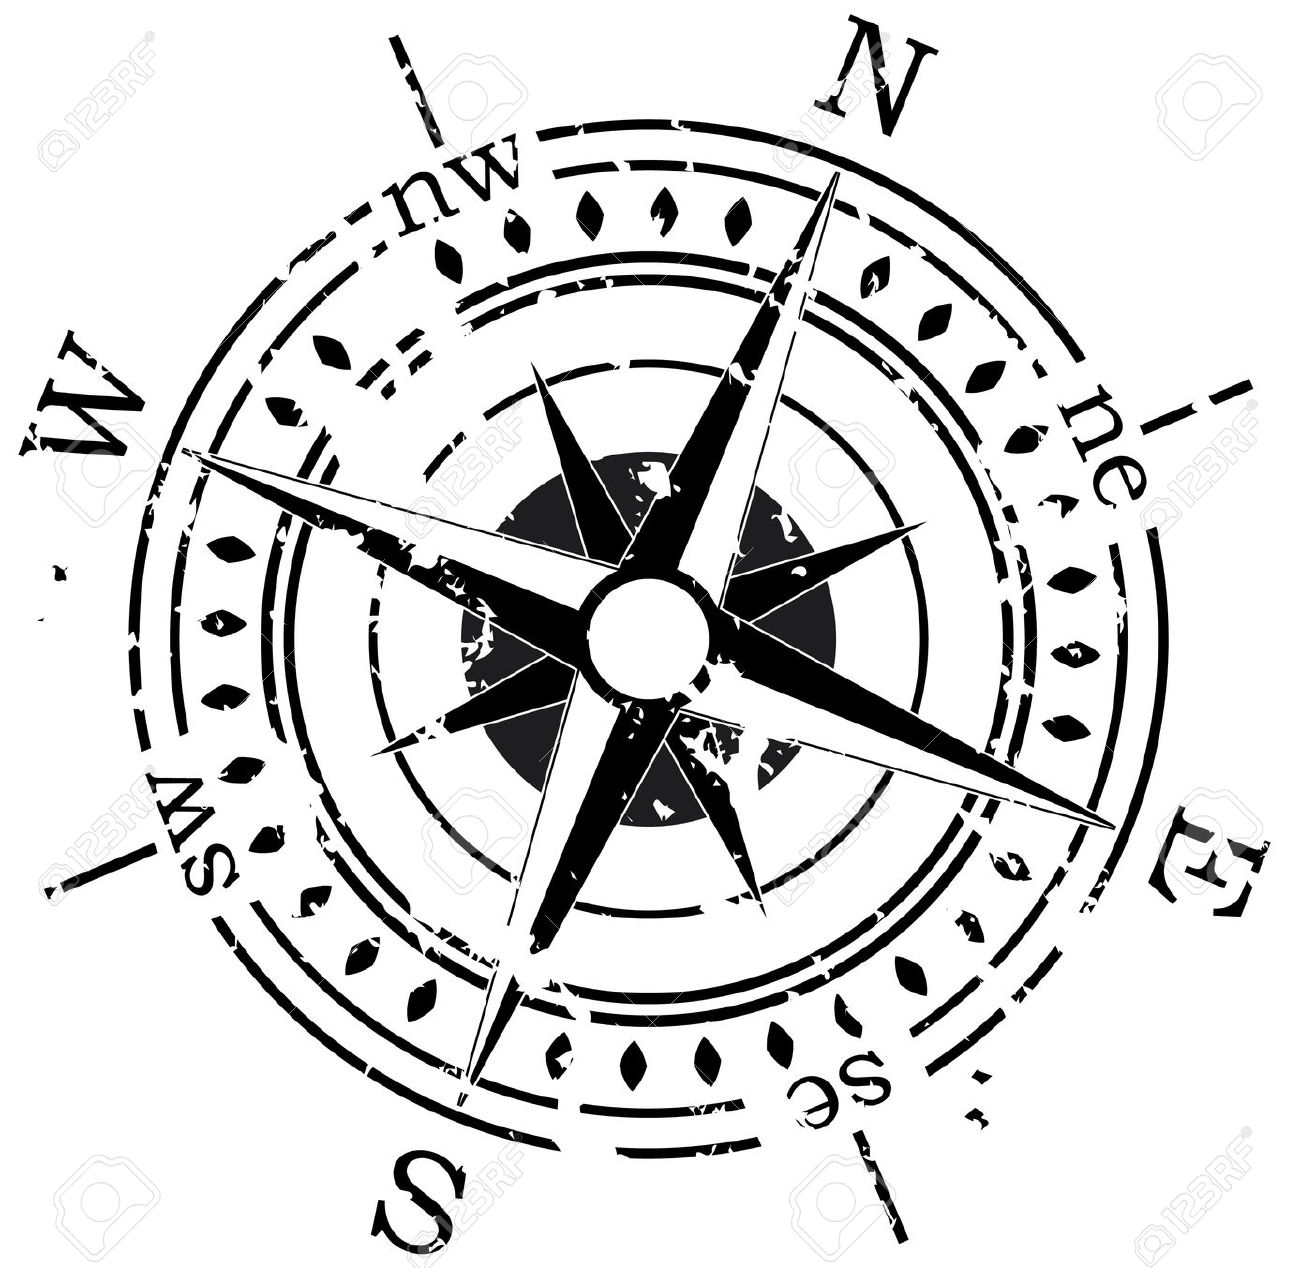 Clipart compass star.